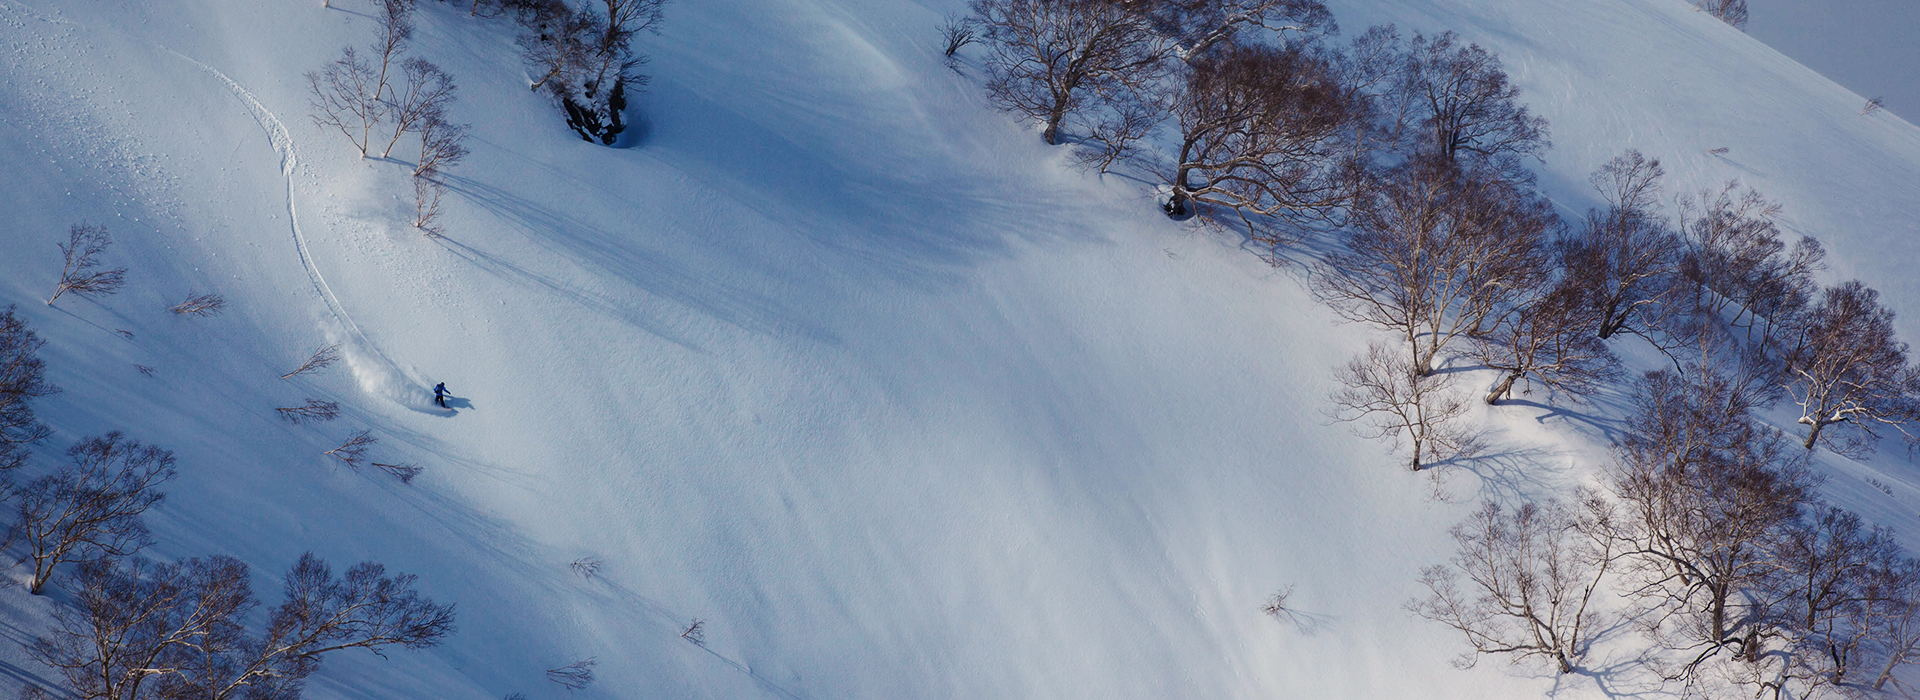 Japan Skiing & Snowboard Travel Guide | evo